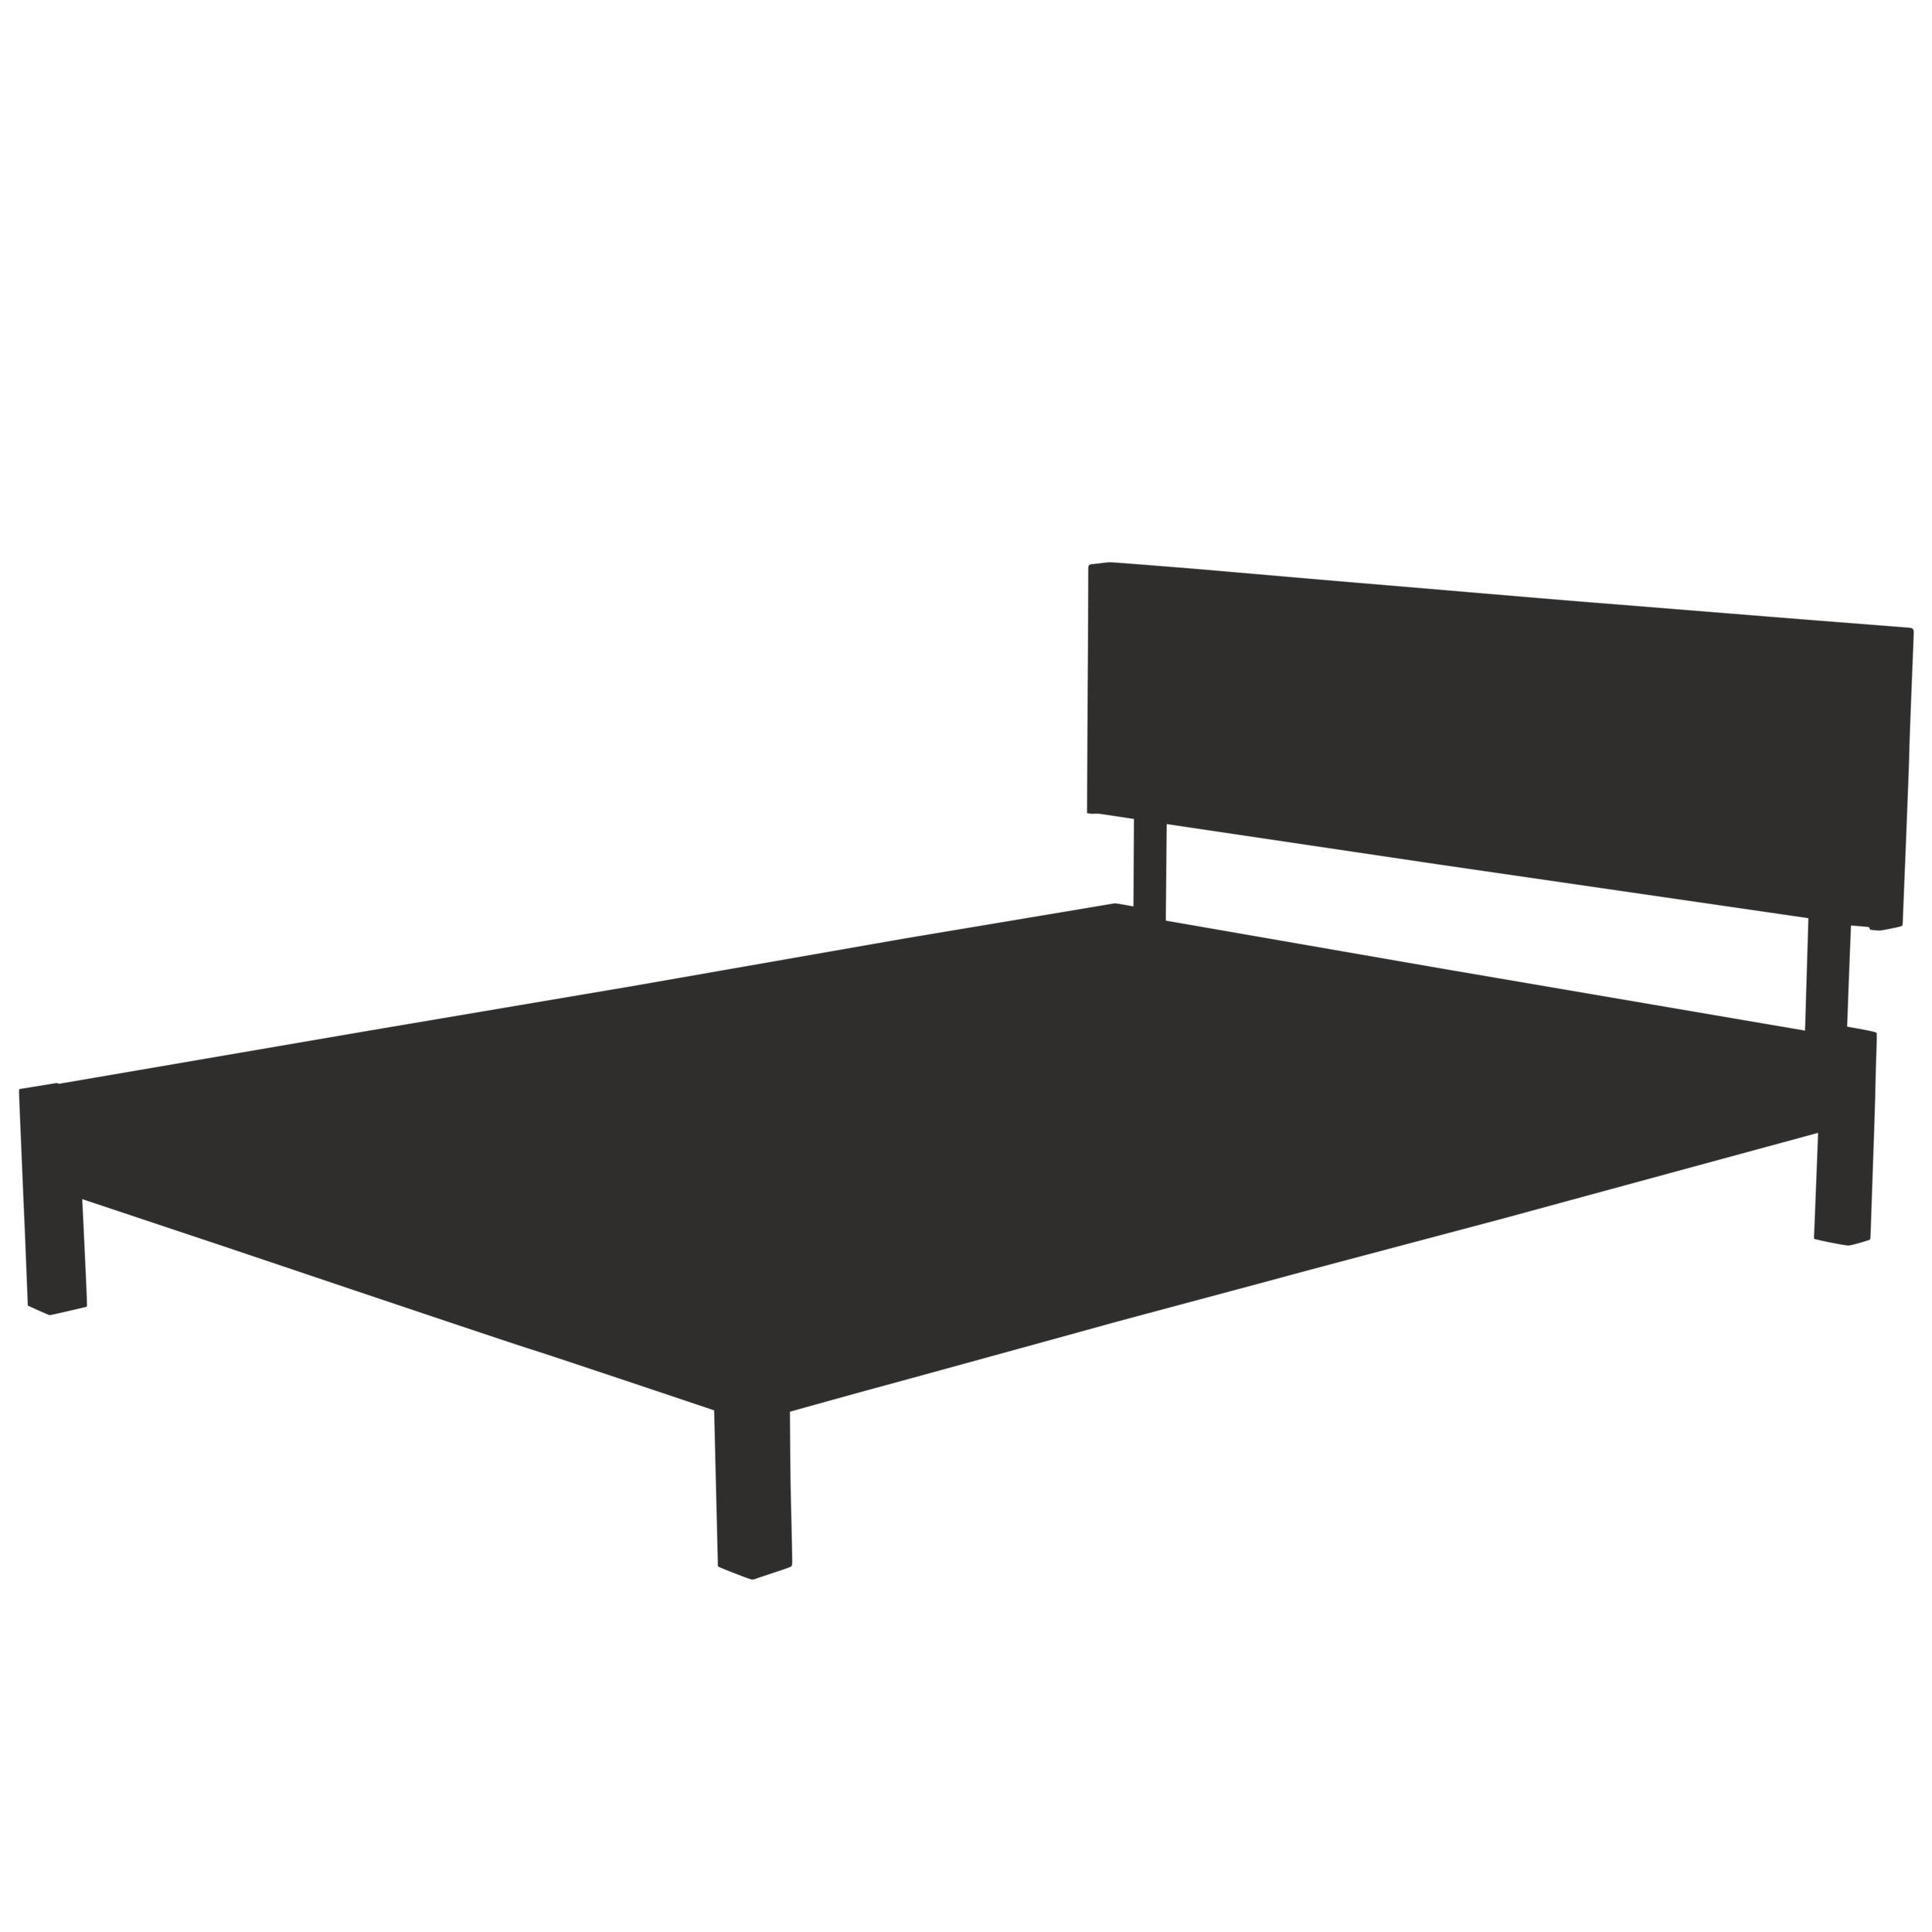 Minim Bed